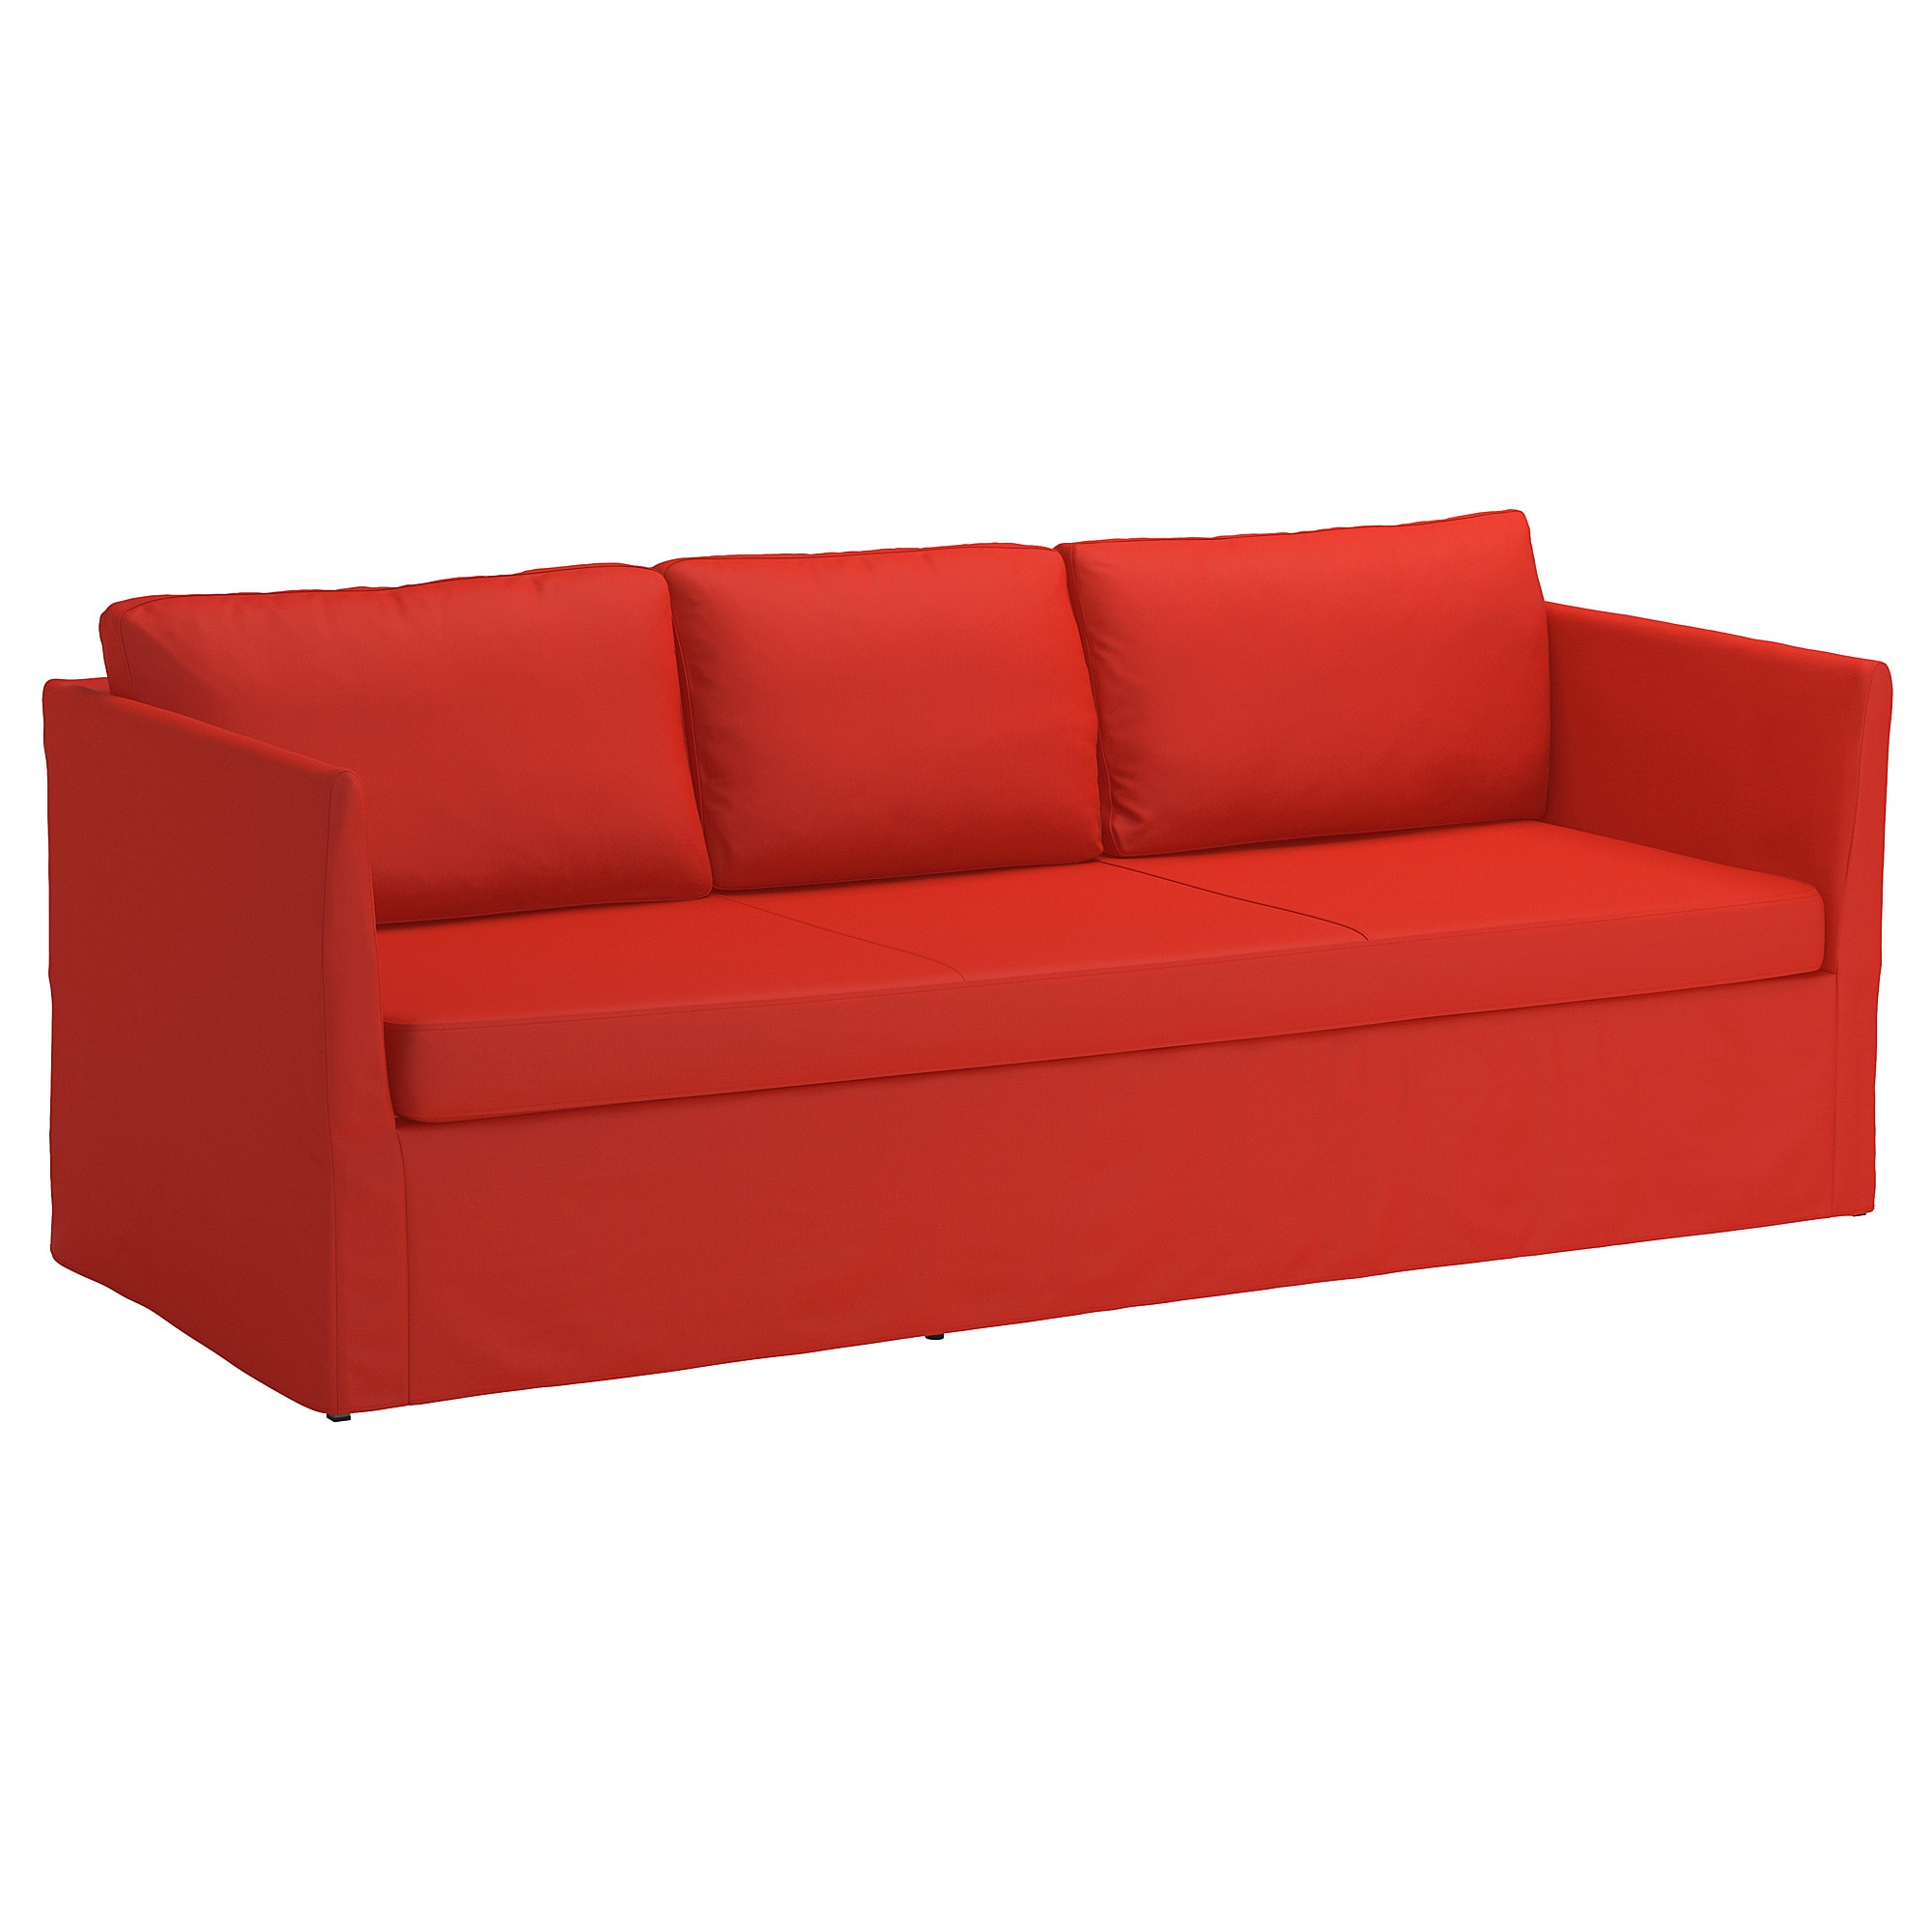 Fundas Para sofas 4pde Brà Thult Funda Para sofà De 3 Plazas Vissle Naranja Rojizo Ikea